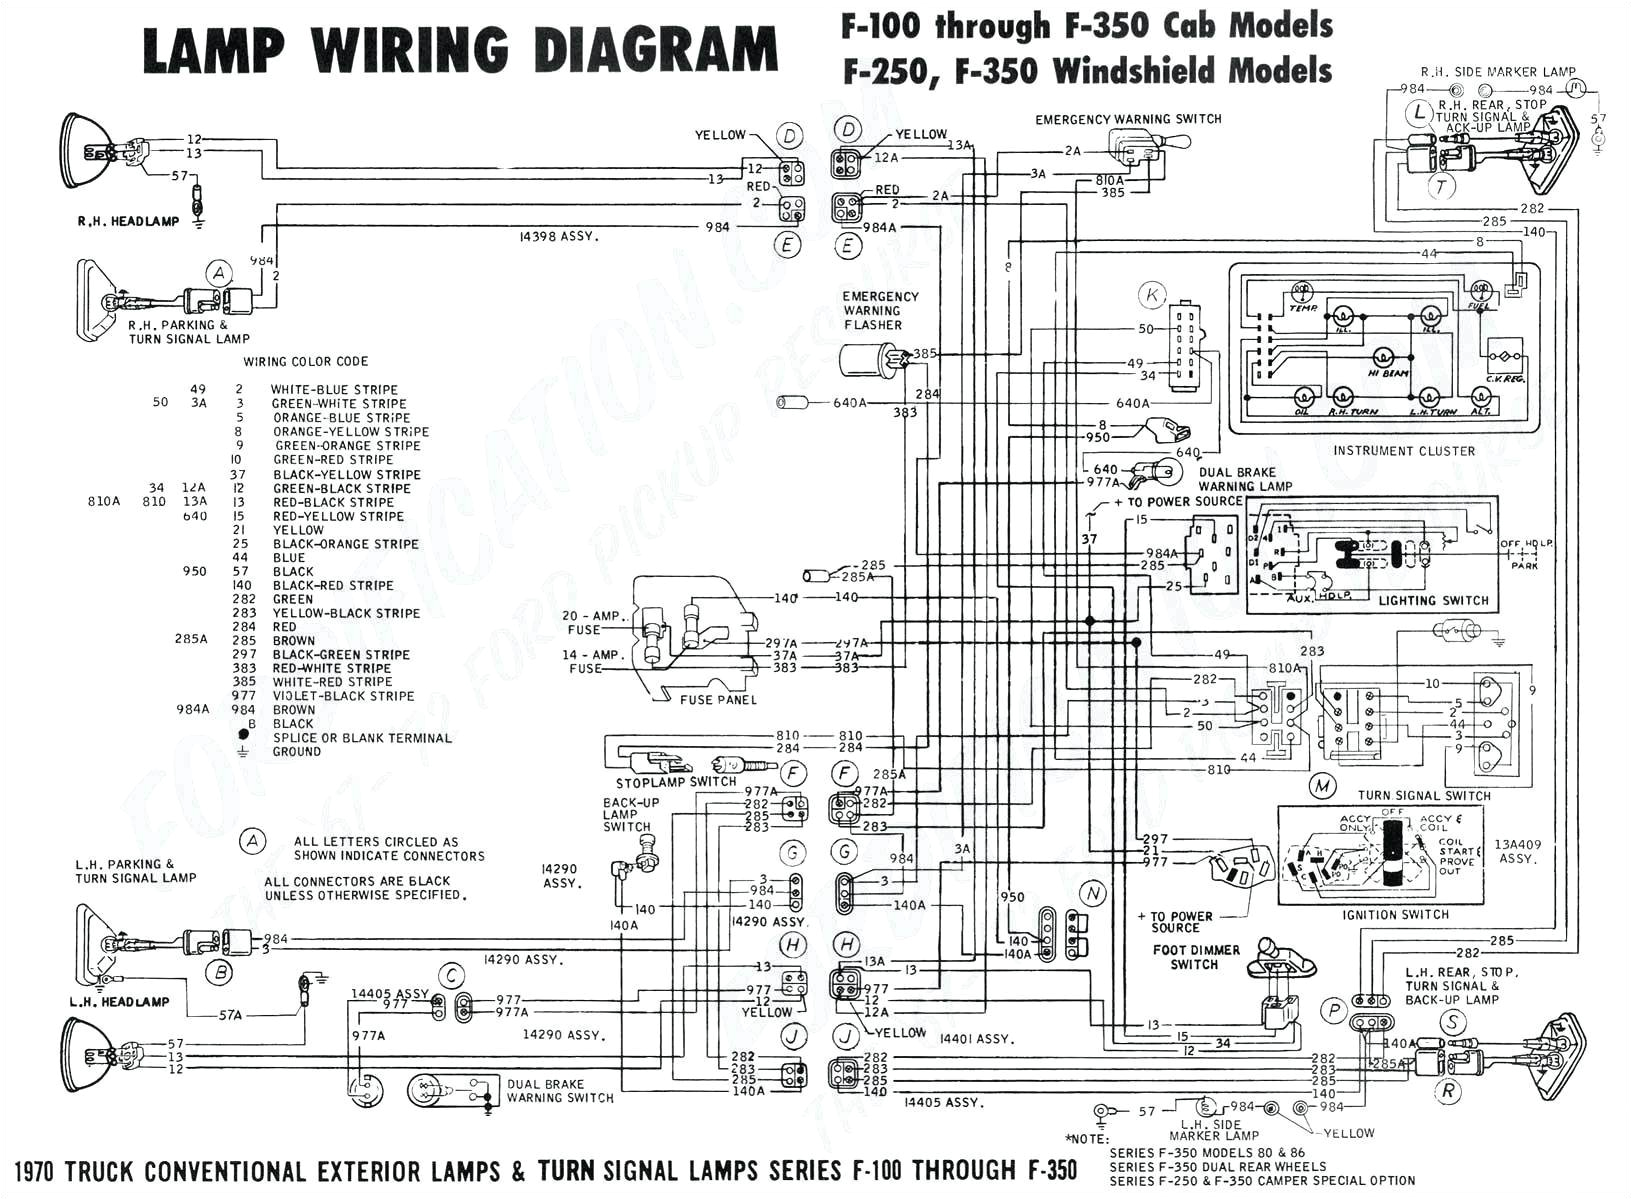 Bayou 220 Wiring Diagram Old Boeing Wiring Diagrams New Wiring Diagram